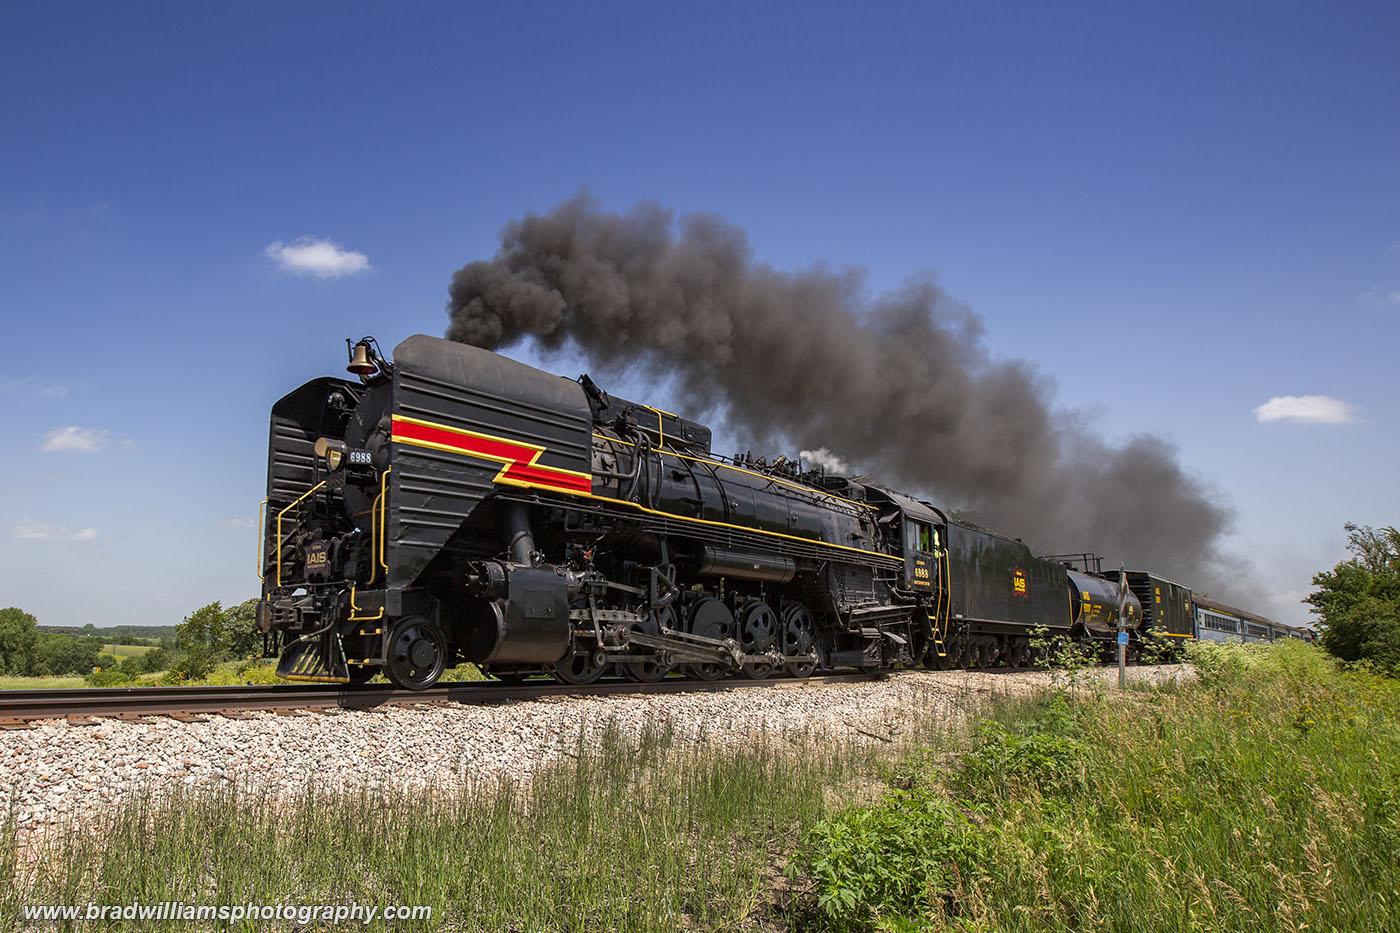 IAIS 6988 running through the Iowa countryside.